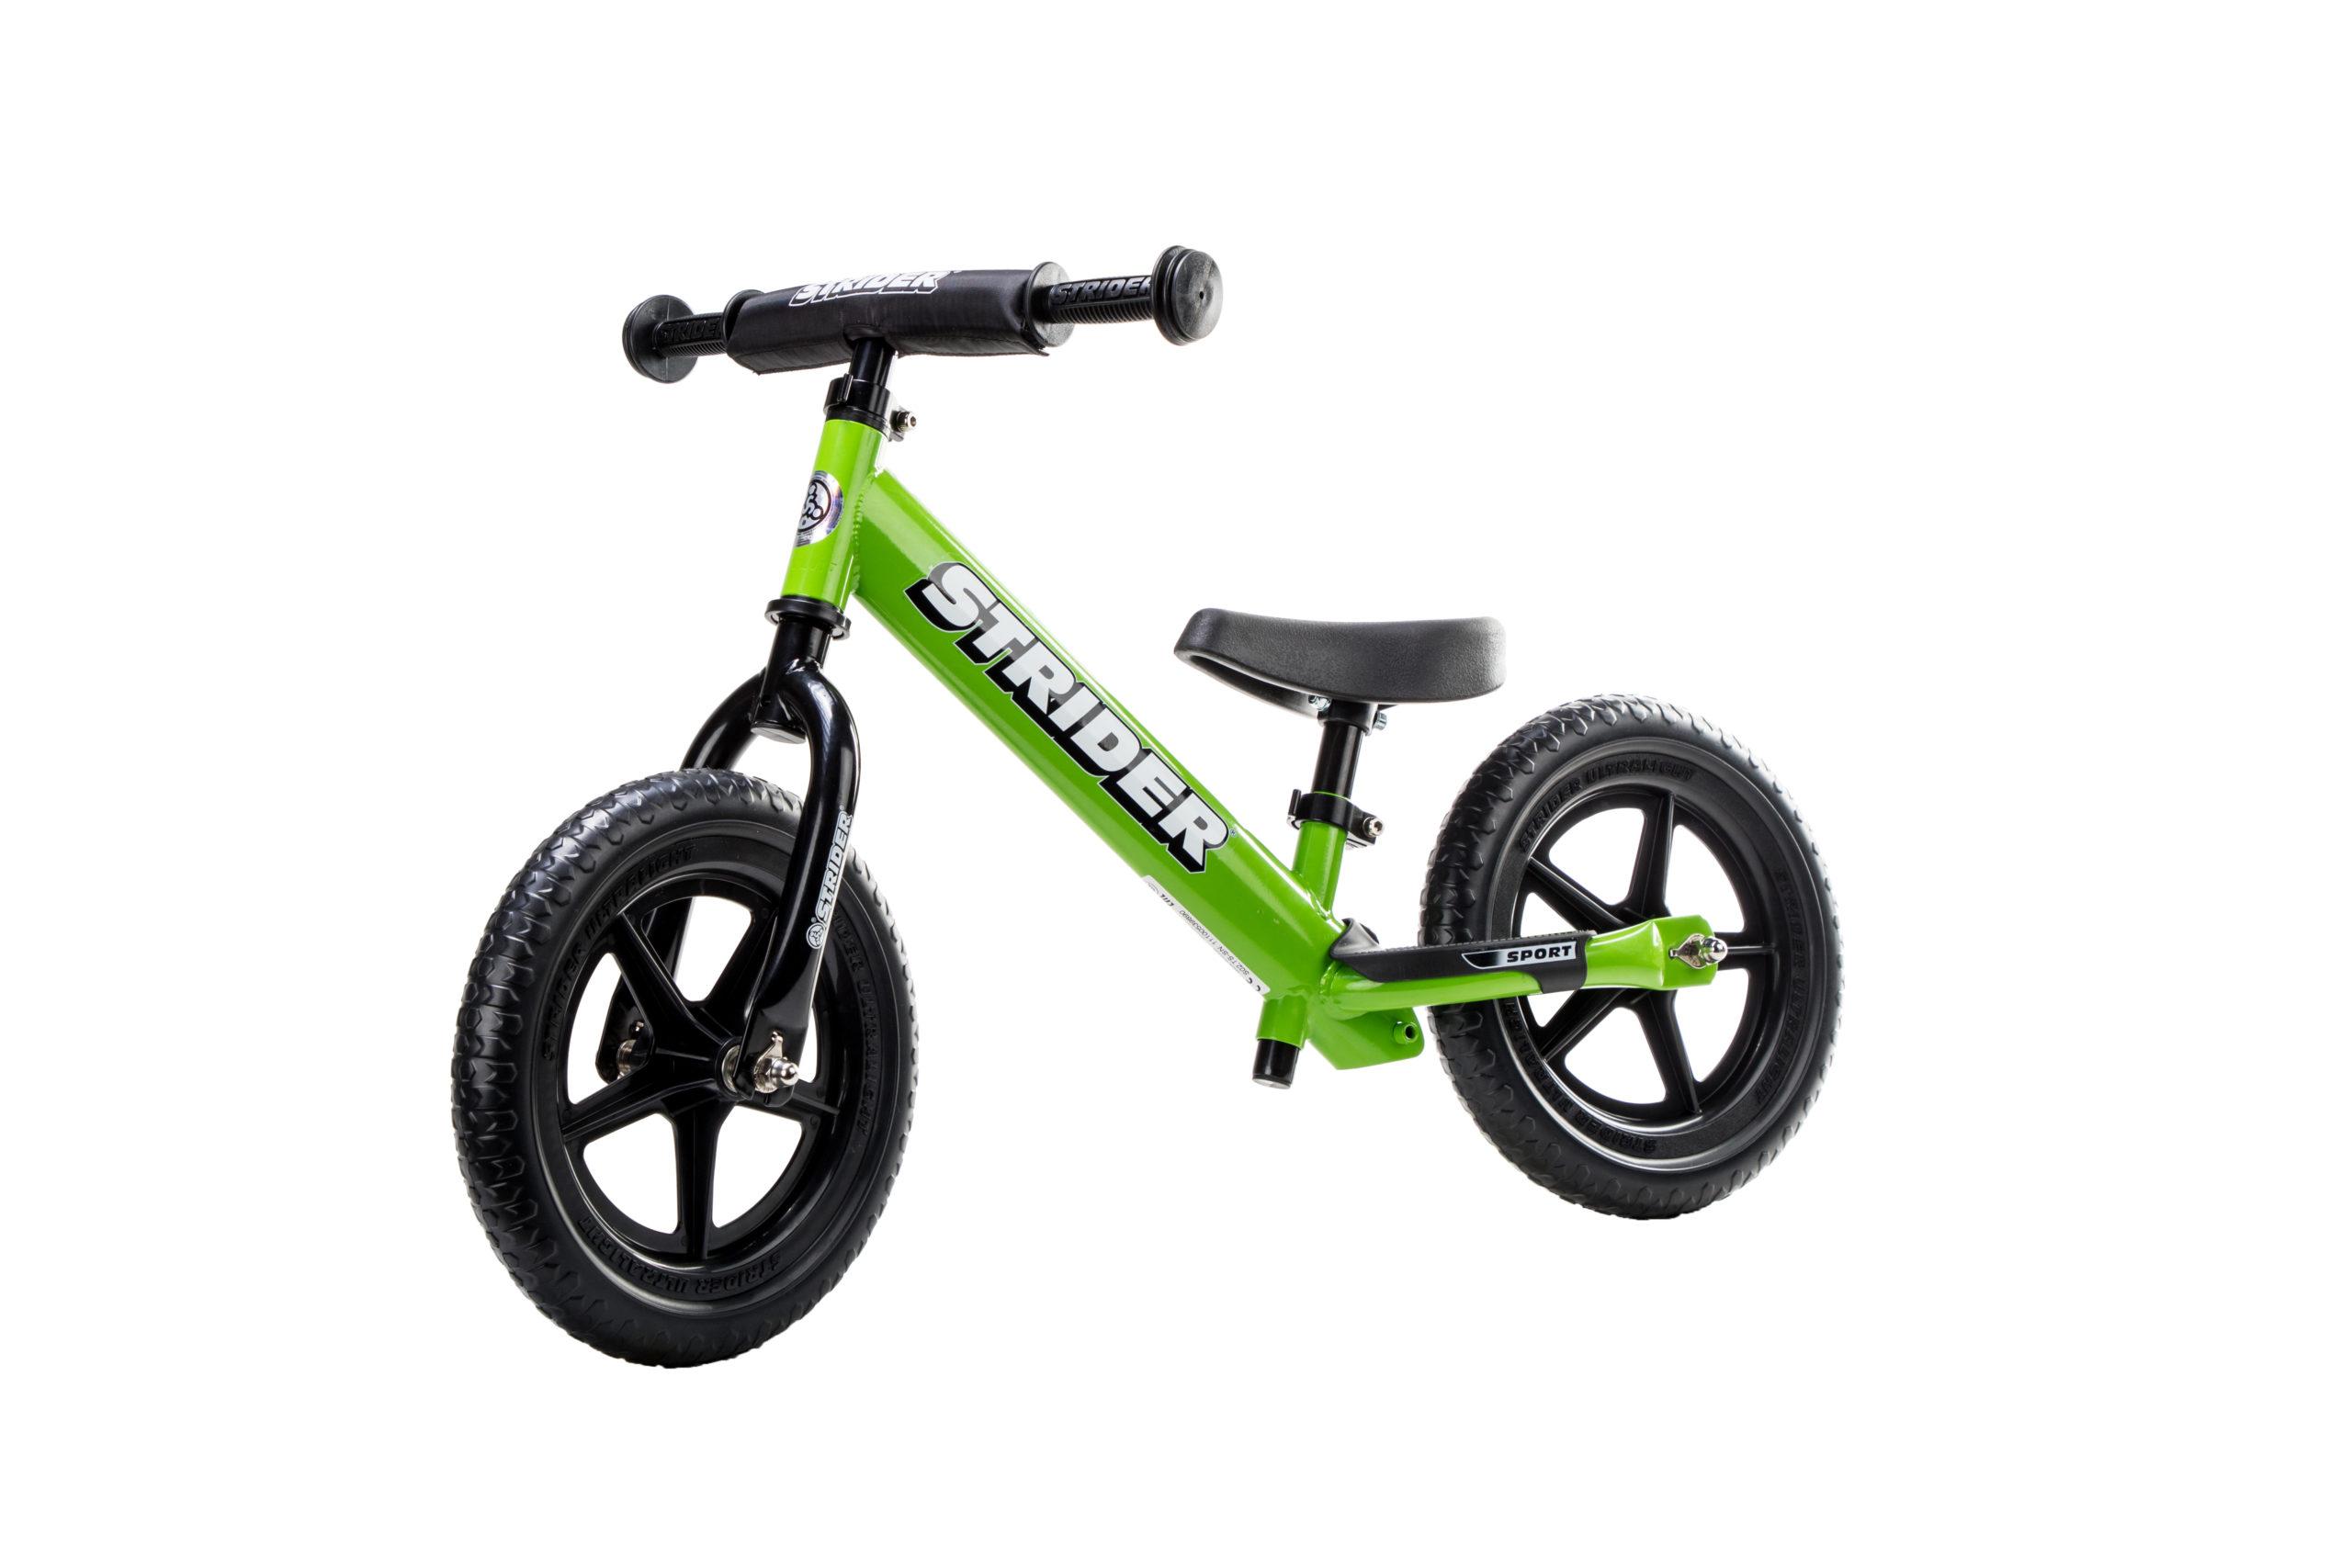 Studio image of Green 12 Sport bike at angle